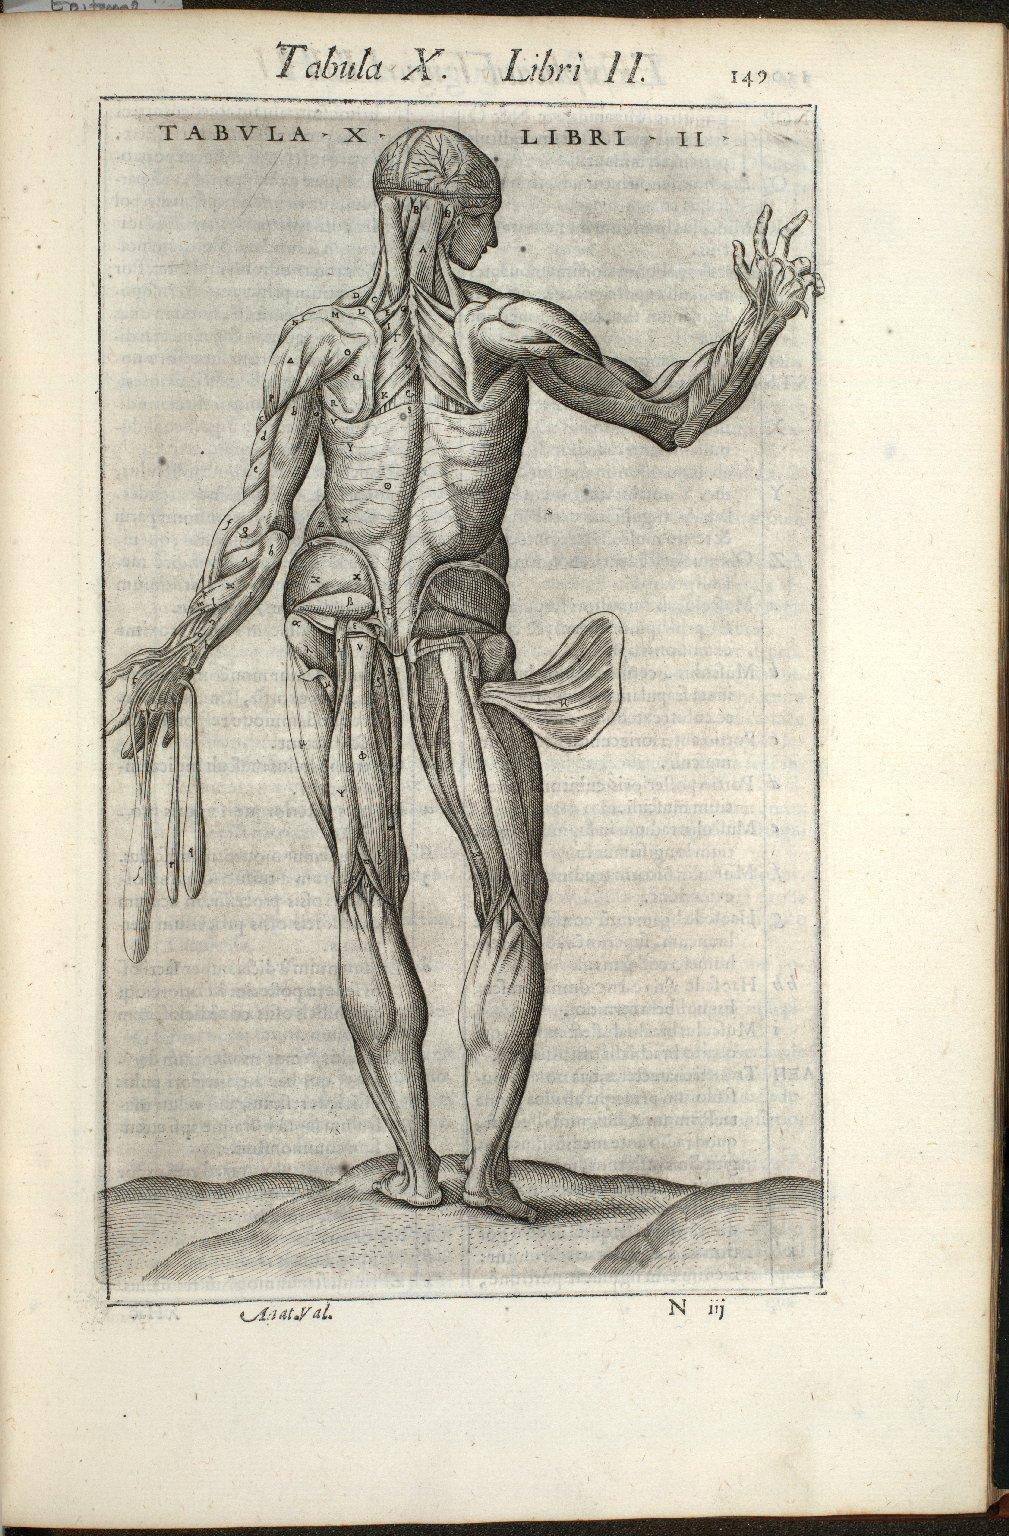 Tabula X. Libri II.